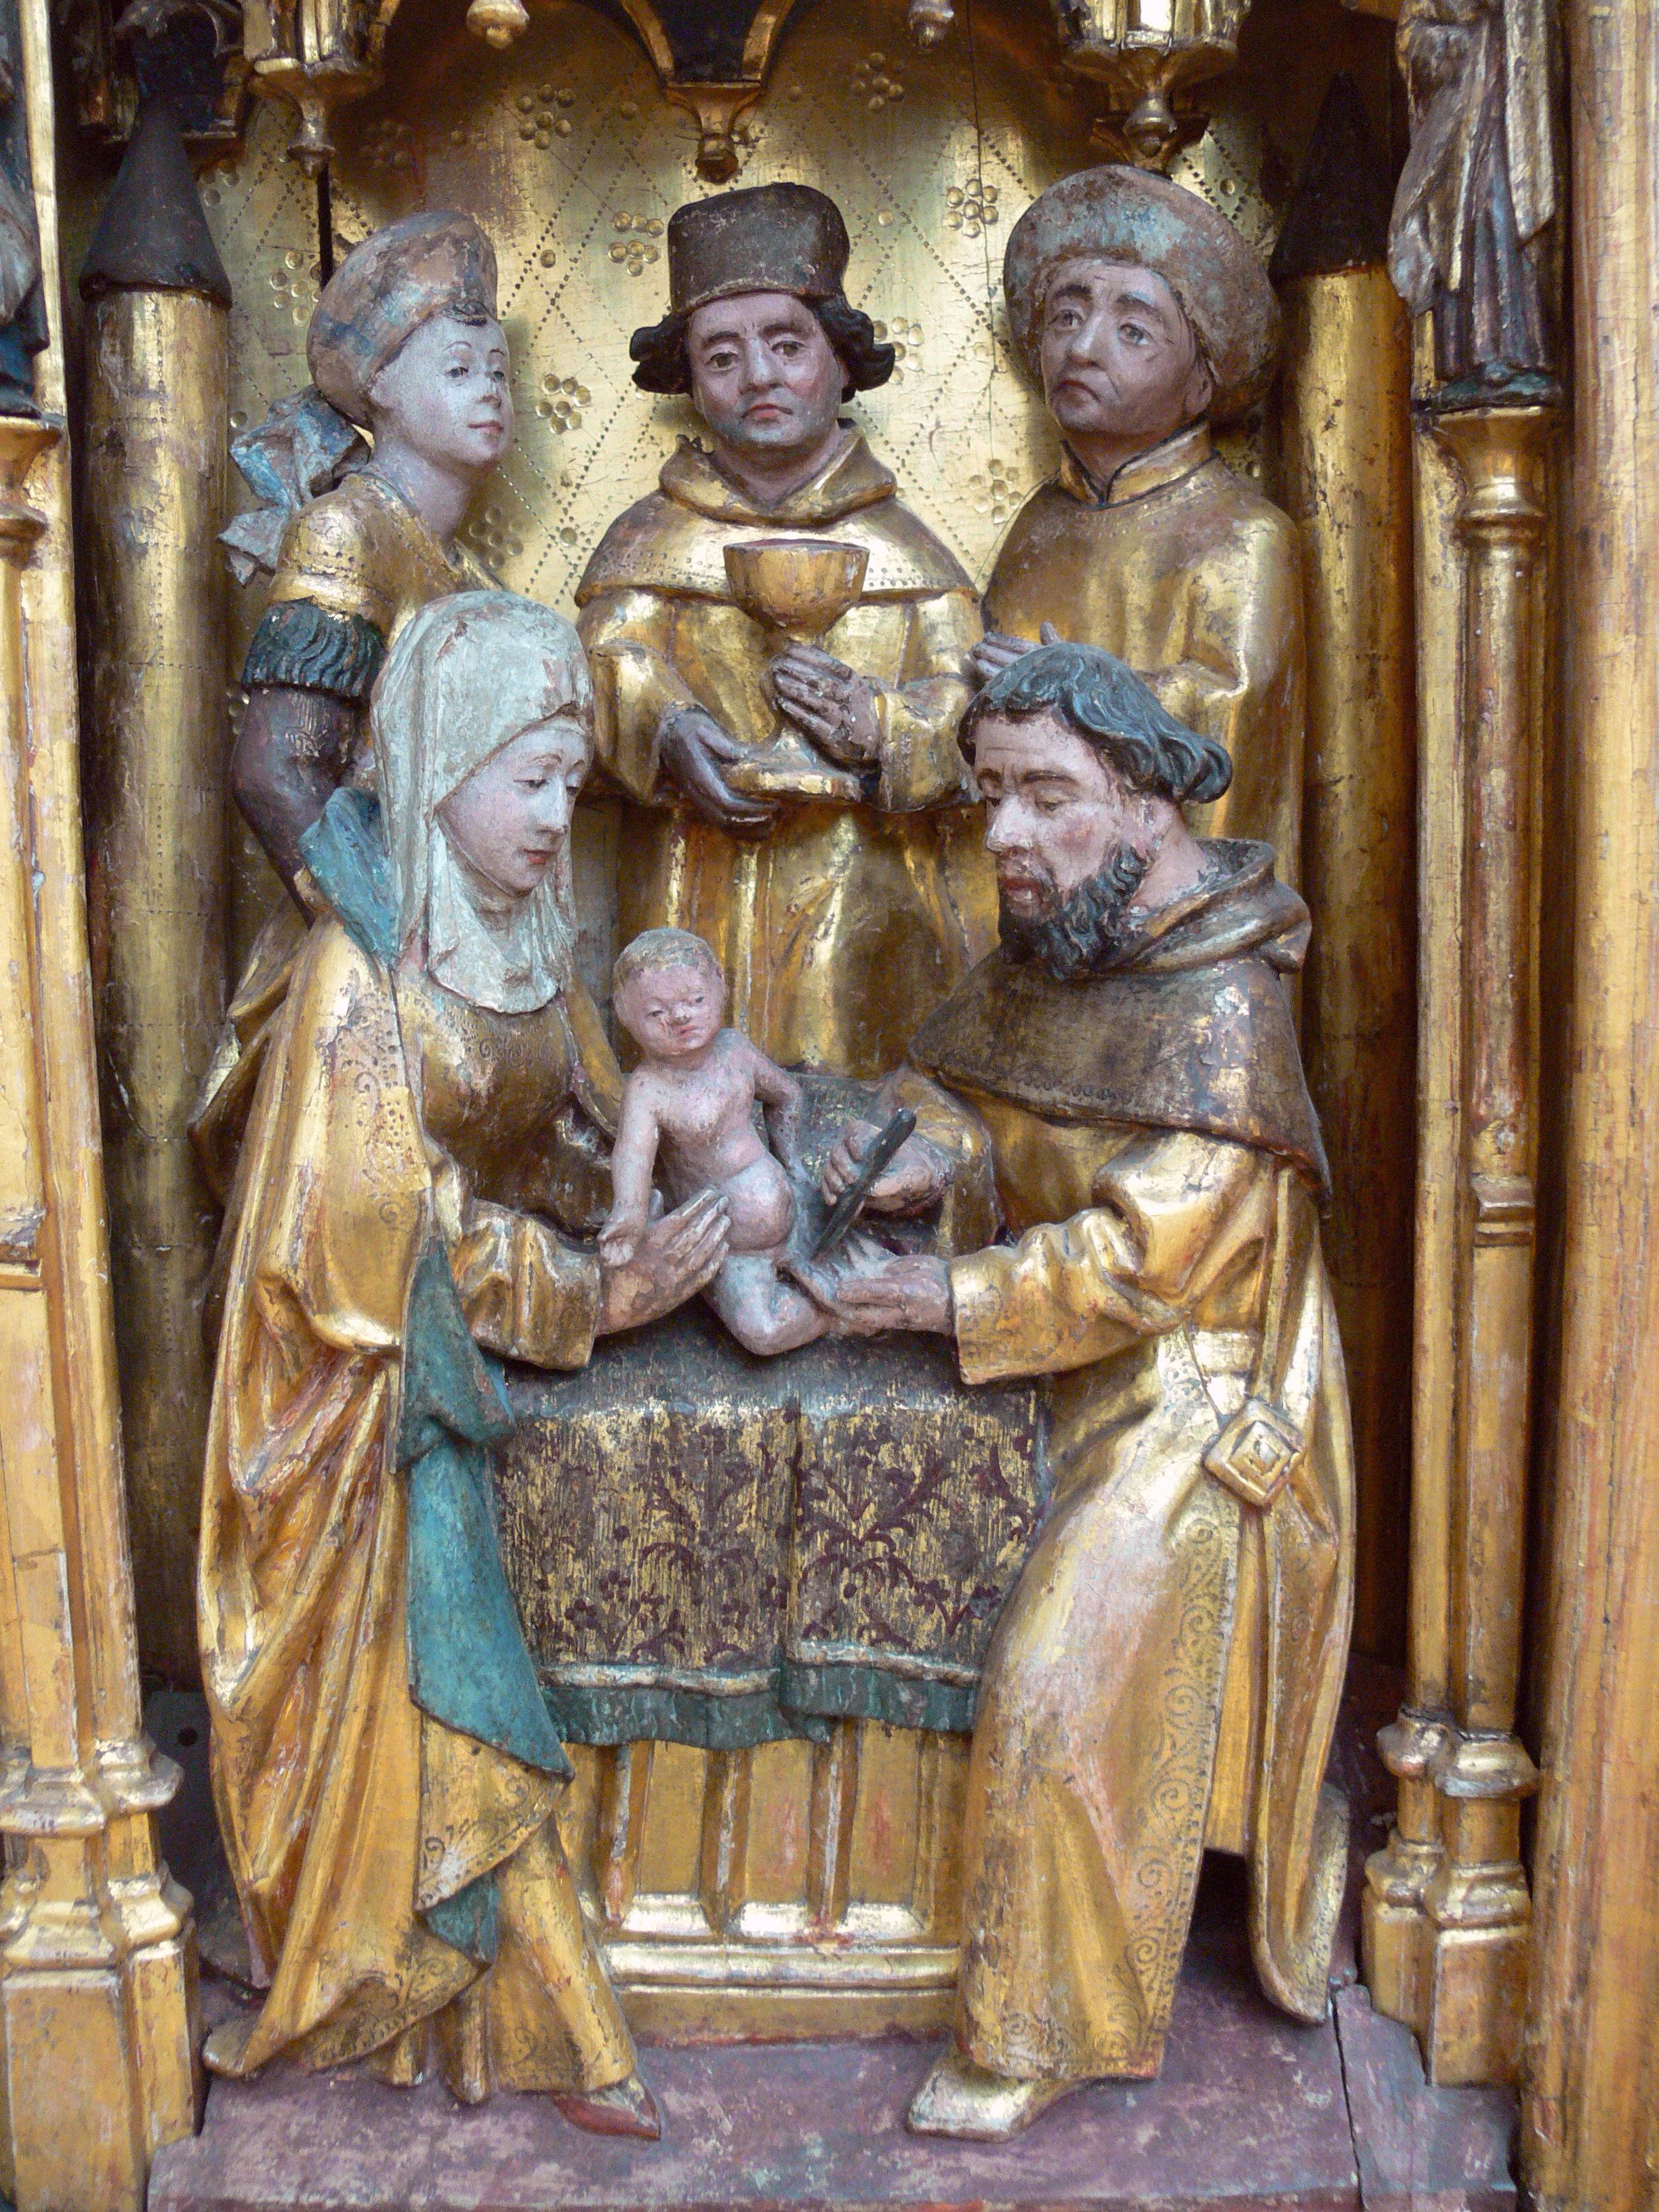 Beschneidung des Herrn. Altarretabel aus Mengen, Nord-Brabant, um 1480 (Berlin, Bode Museum).